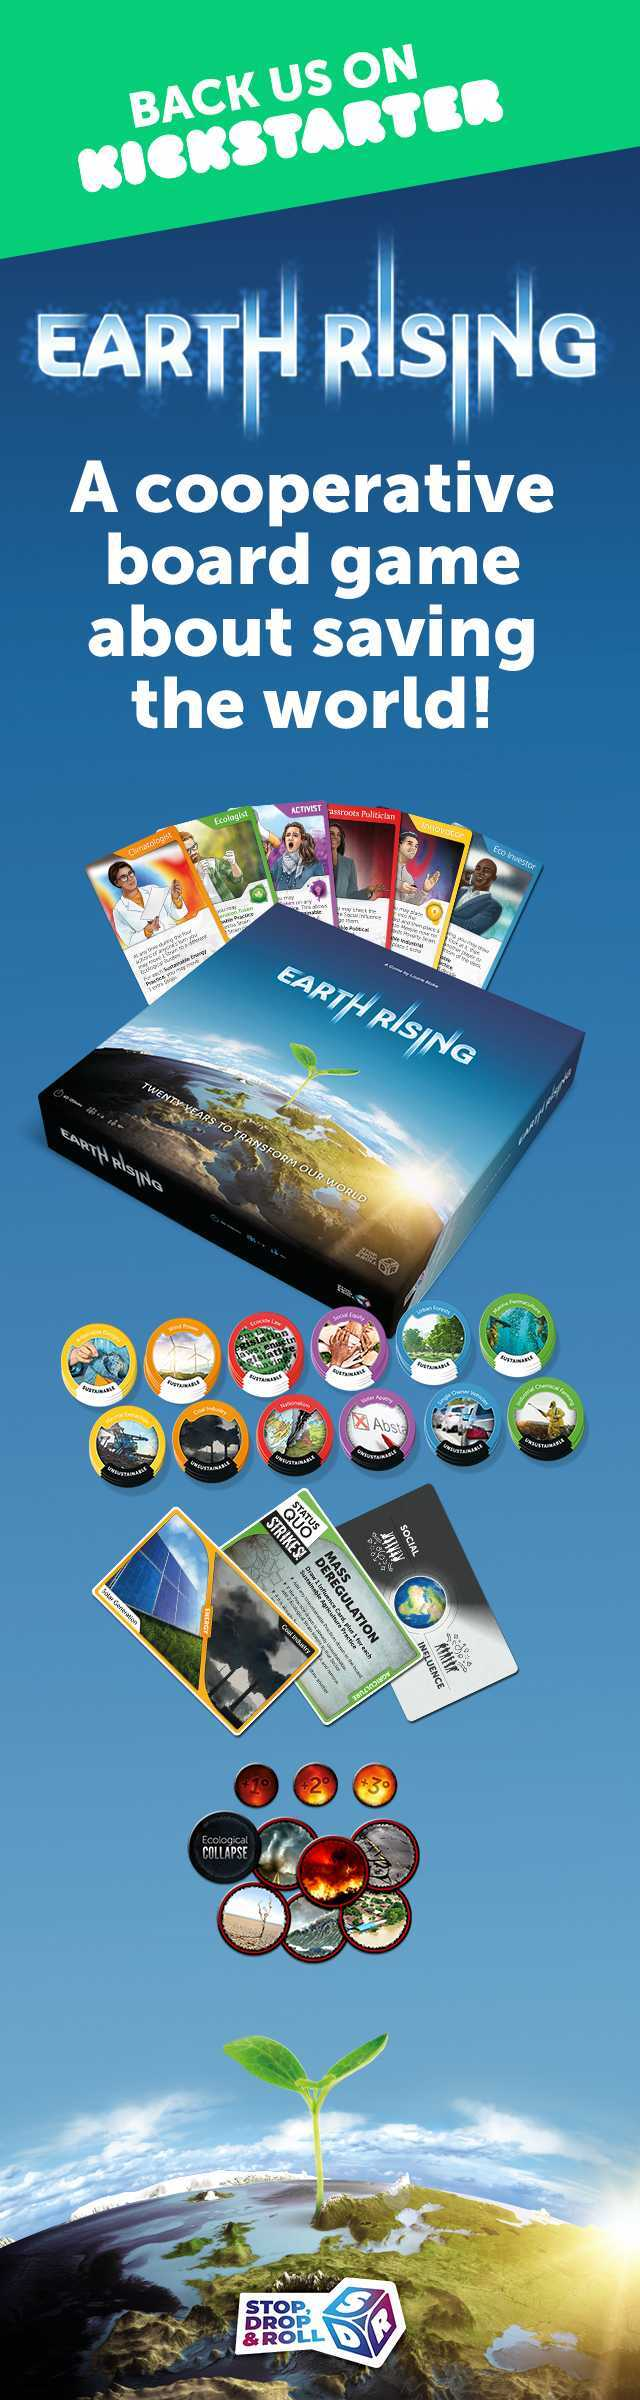 Earth Rising board game banner